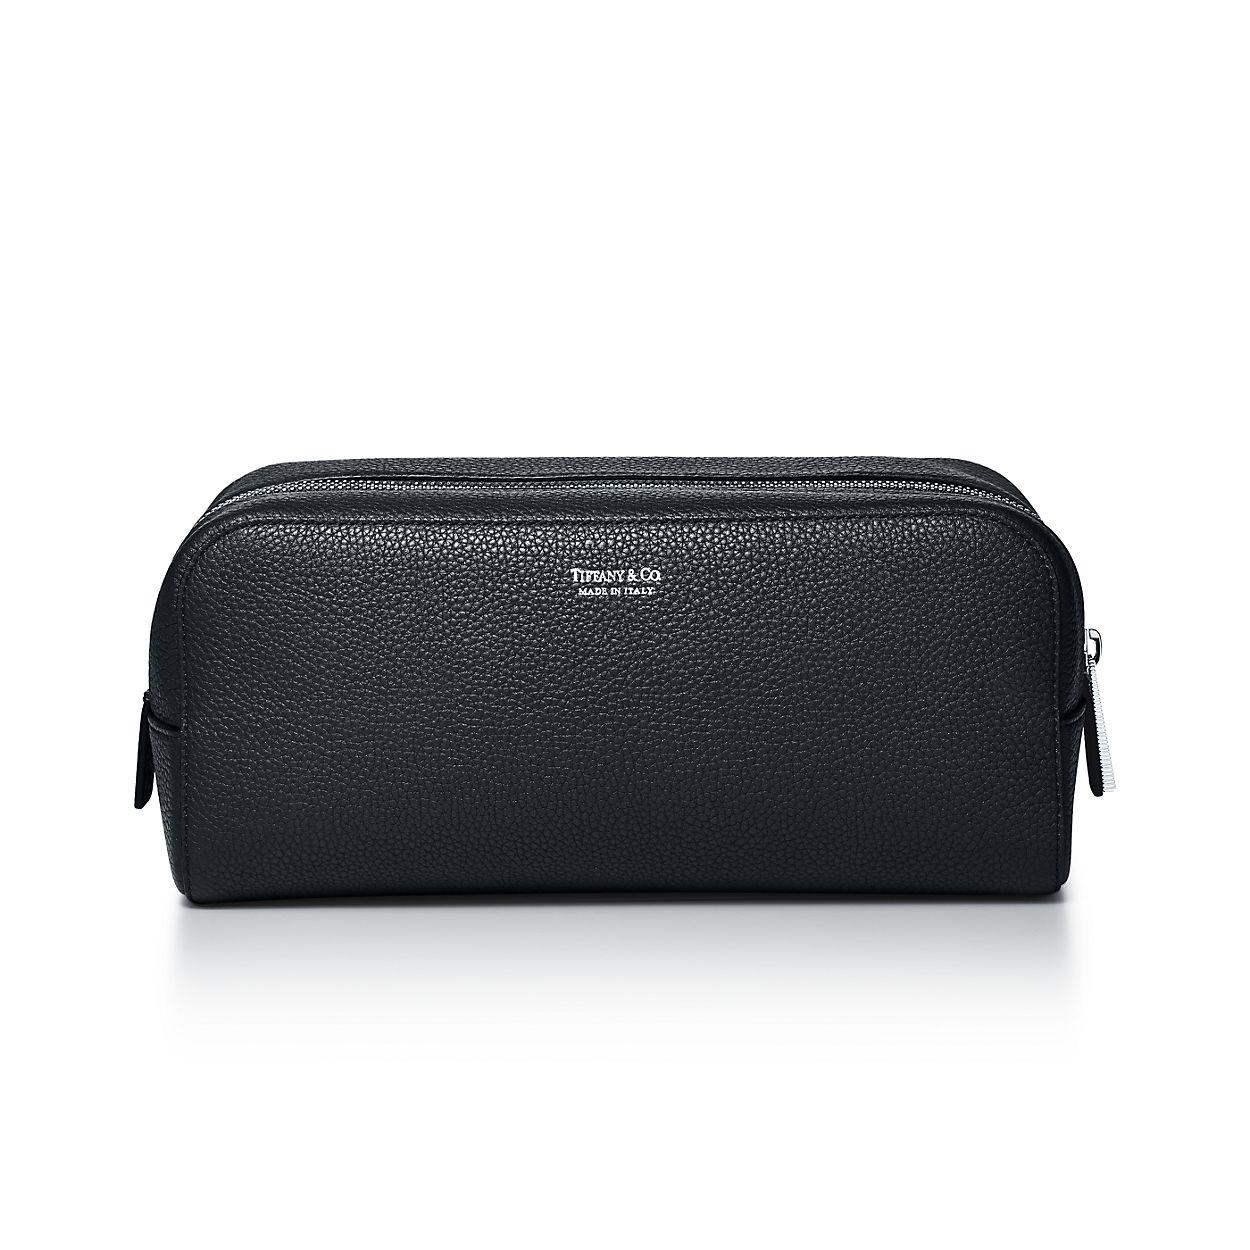 c1ecd56d5a9a Dopp kit in black grain calfskin leather